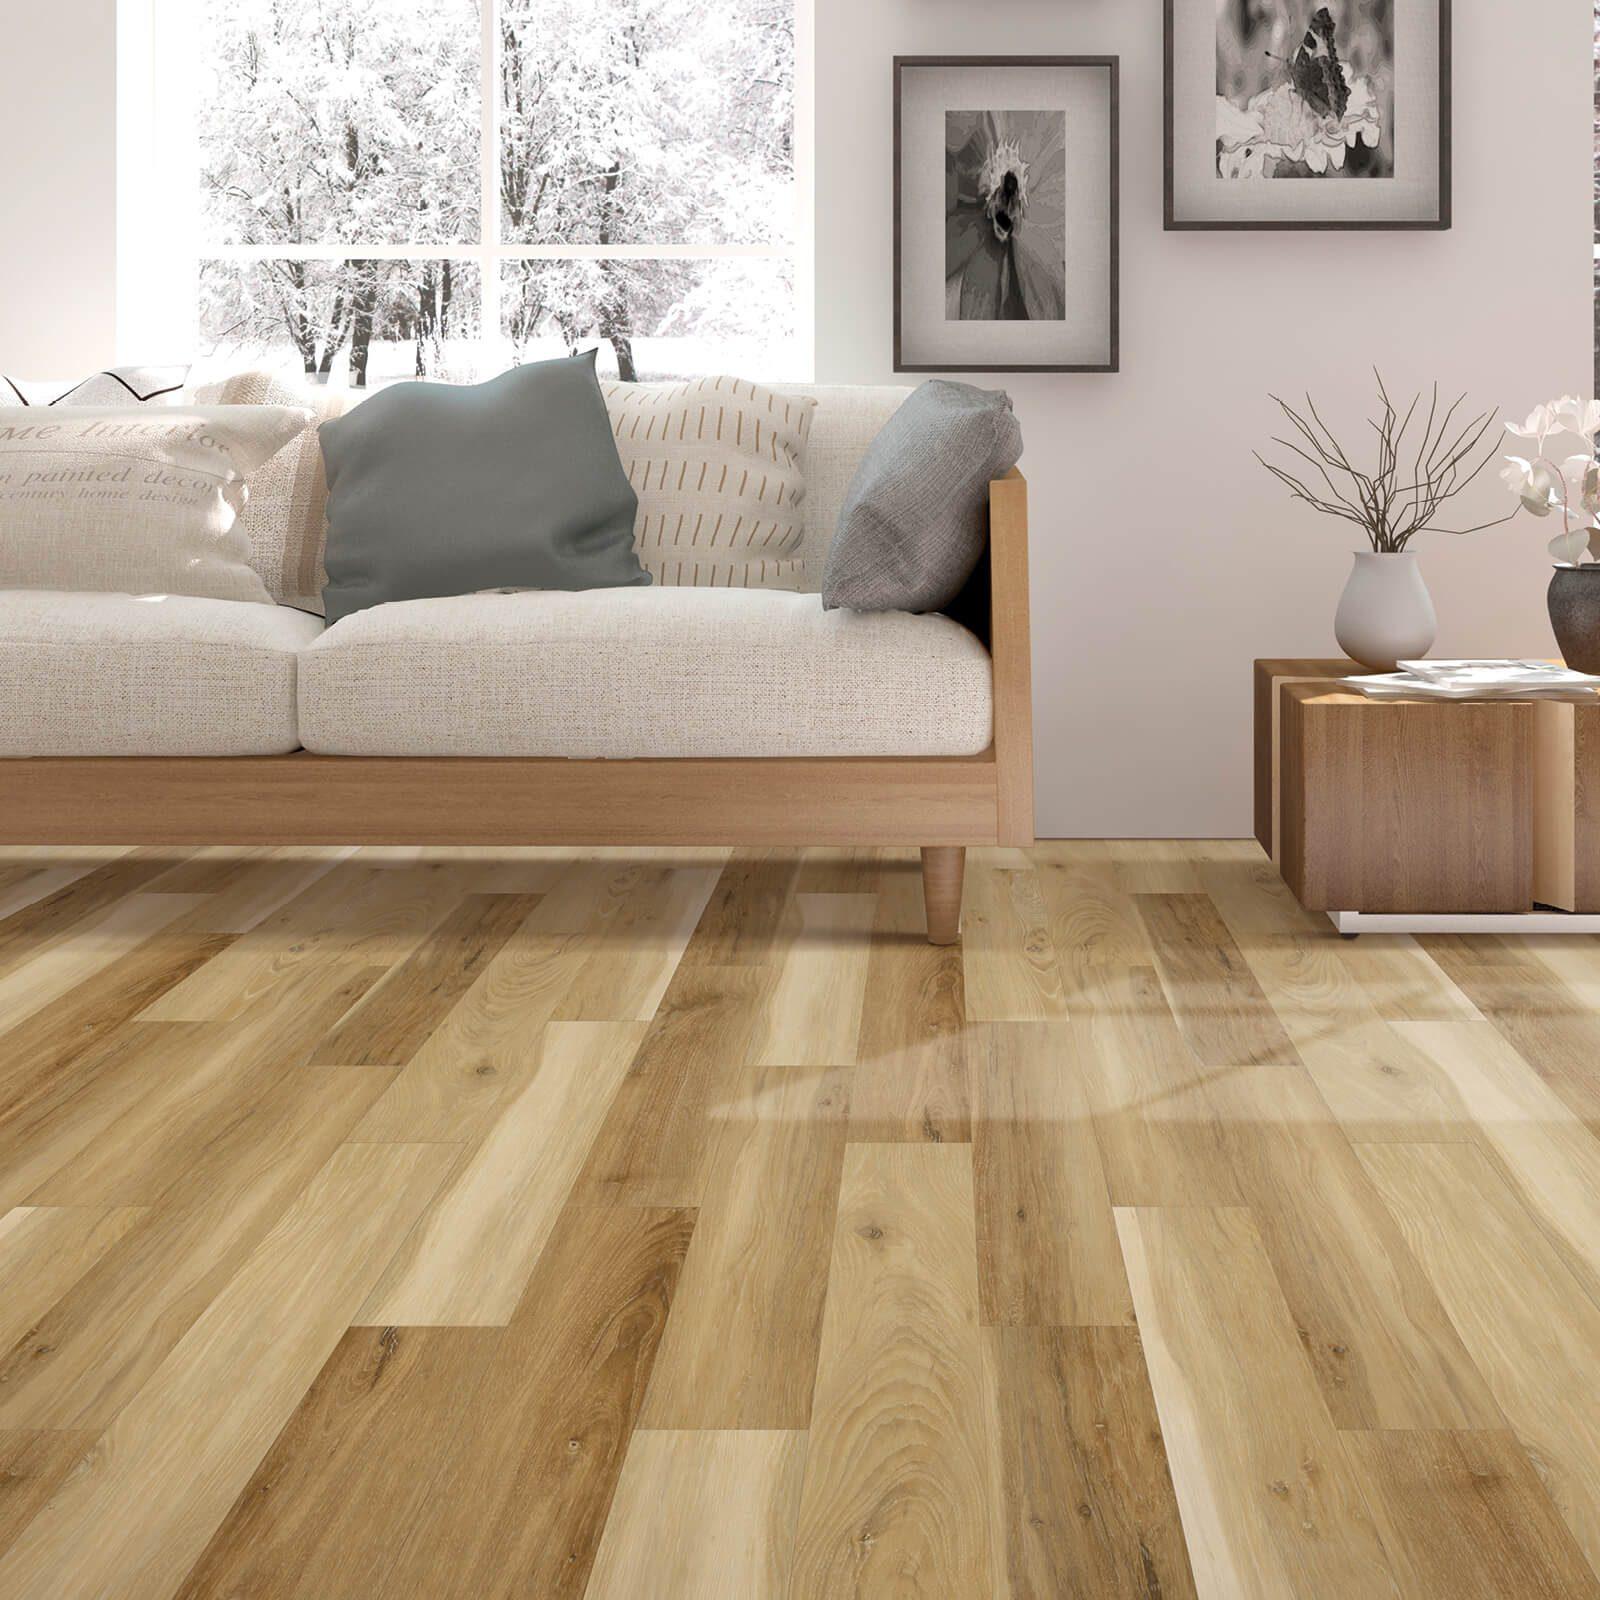 Sofa on laminate floor | Markville Carpet & Flooring